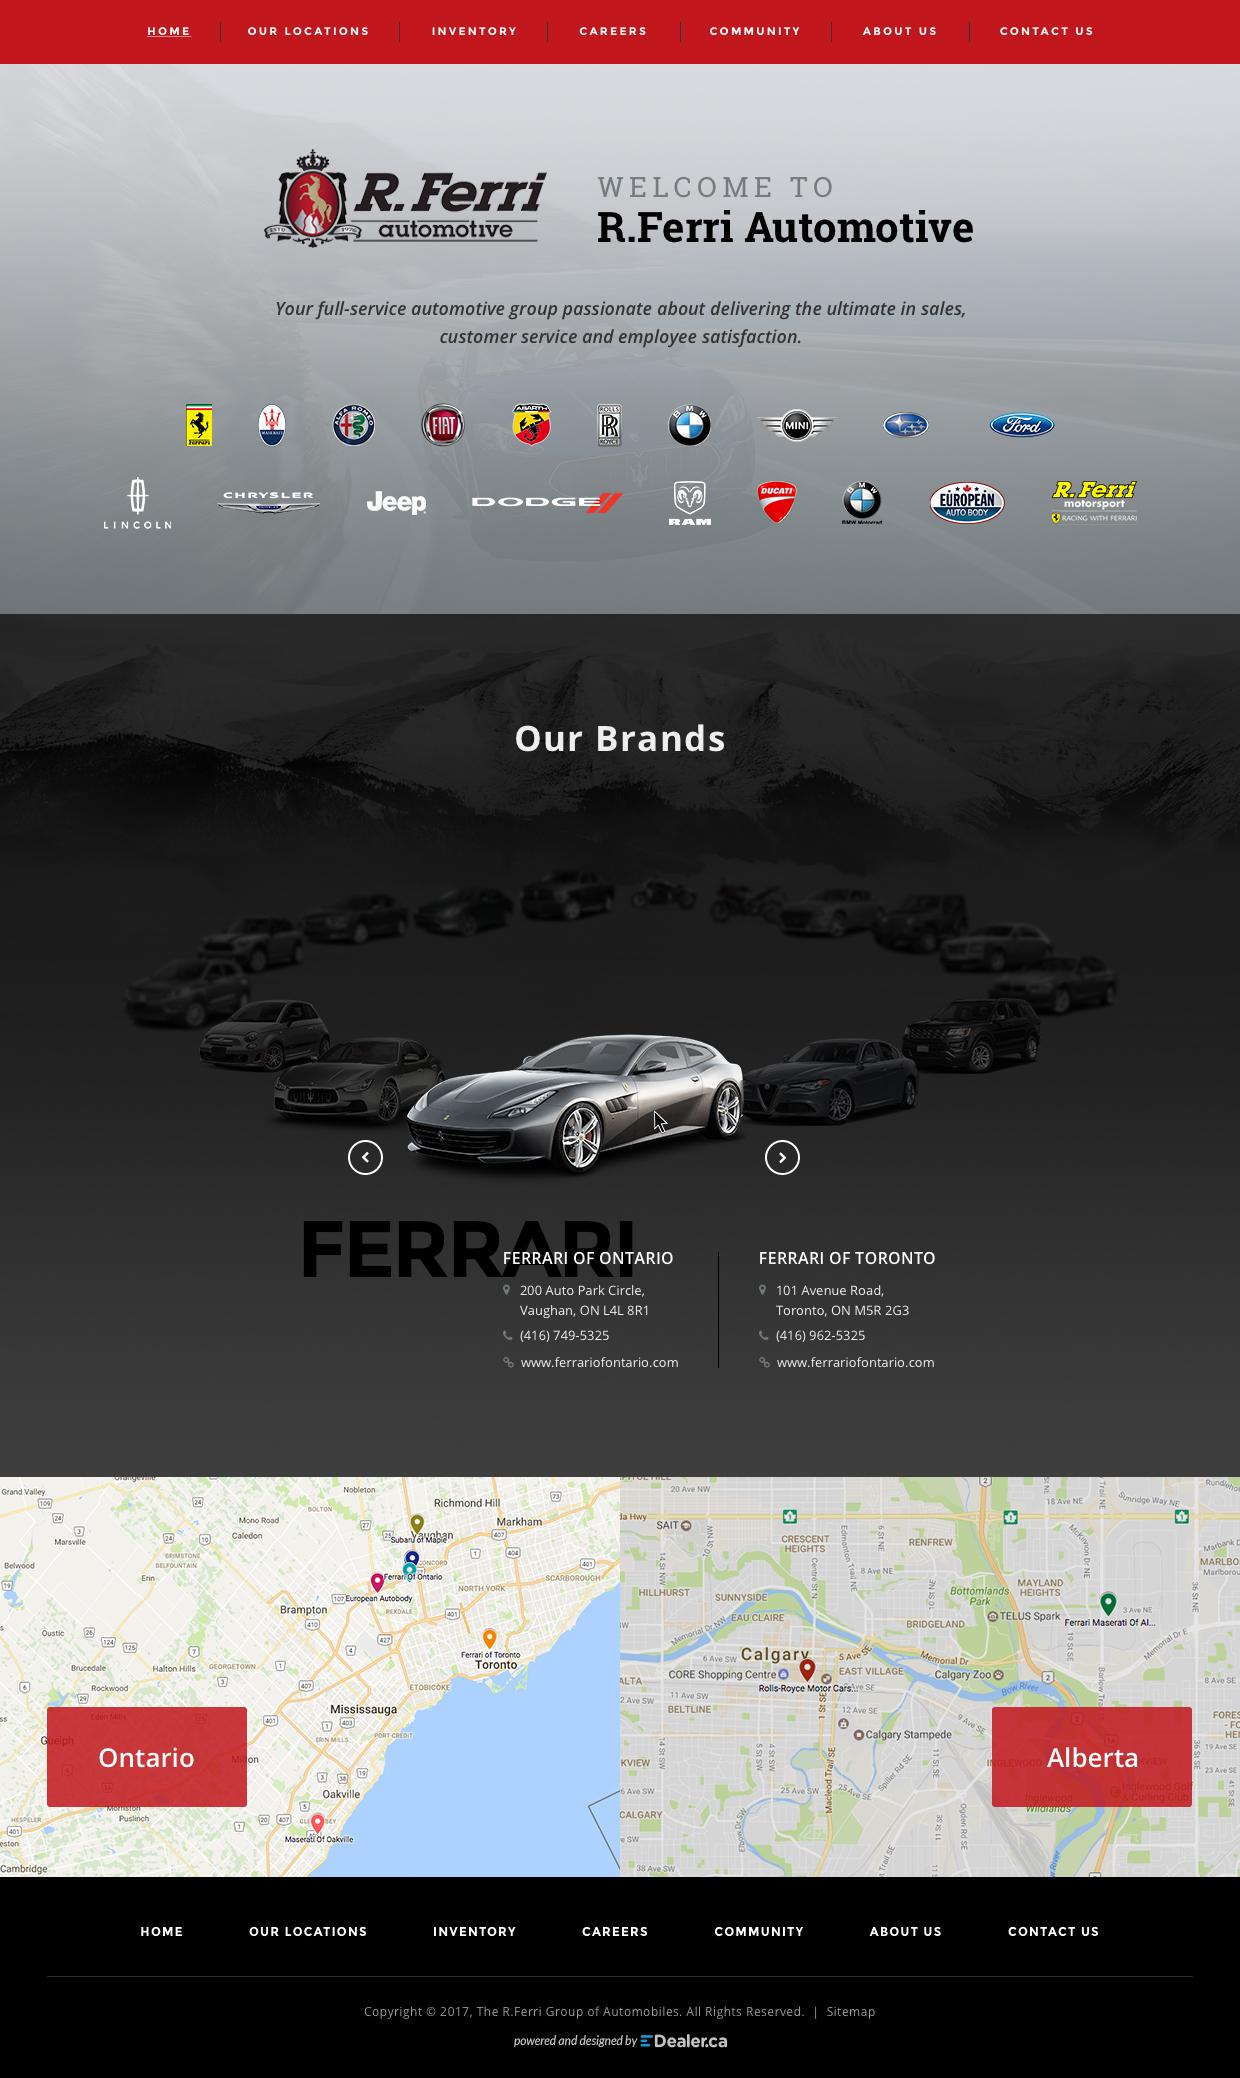 R. Ferri Automotive